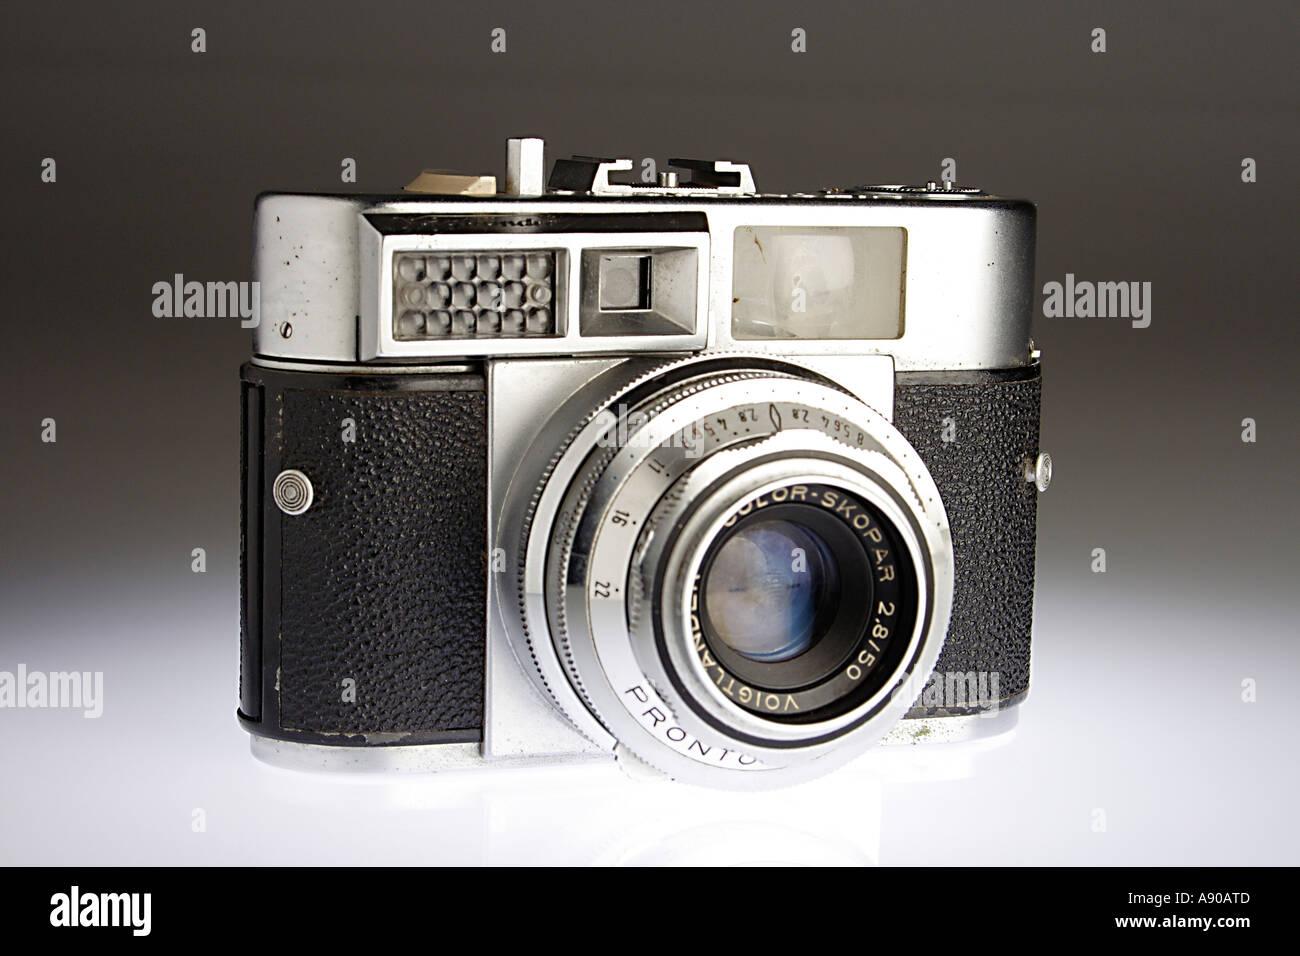 Vda alte antike fotografie kamera entfernungsmesser